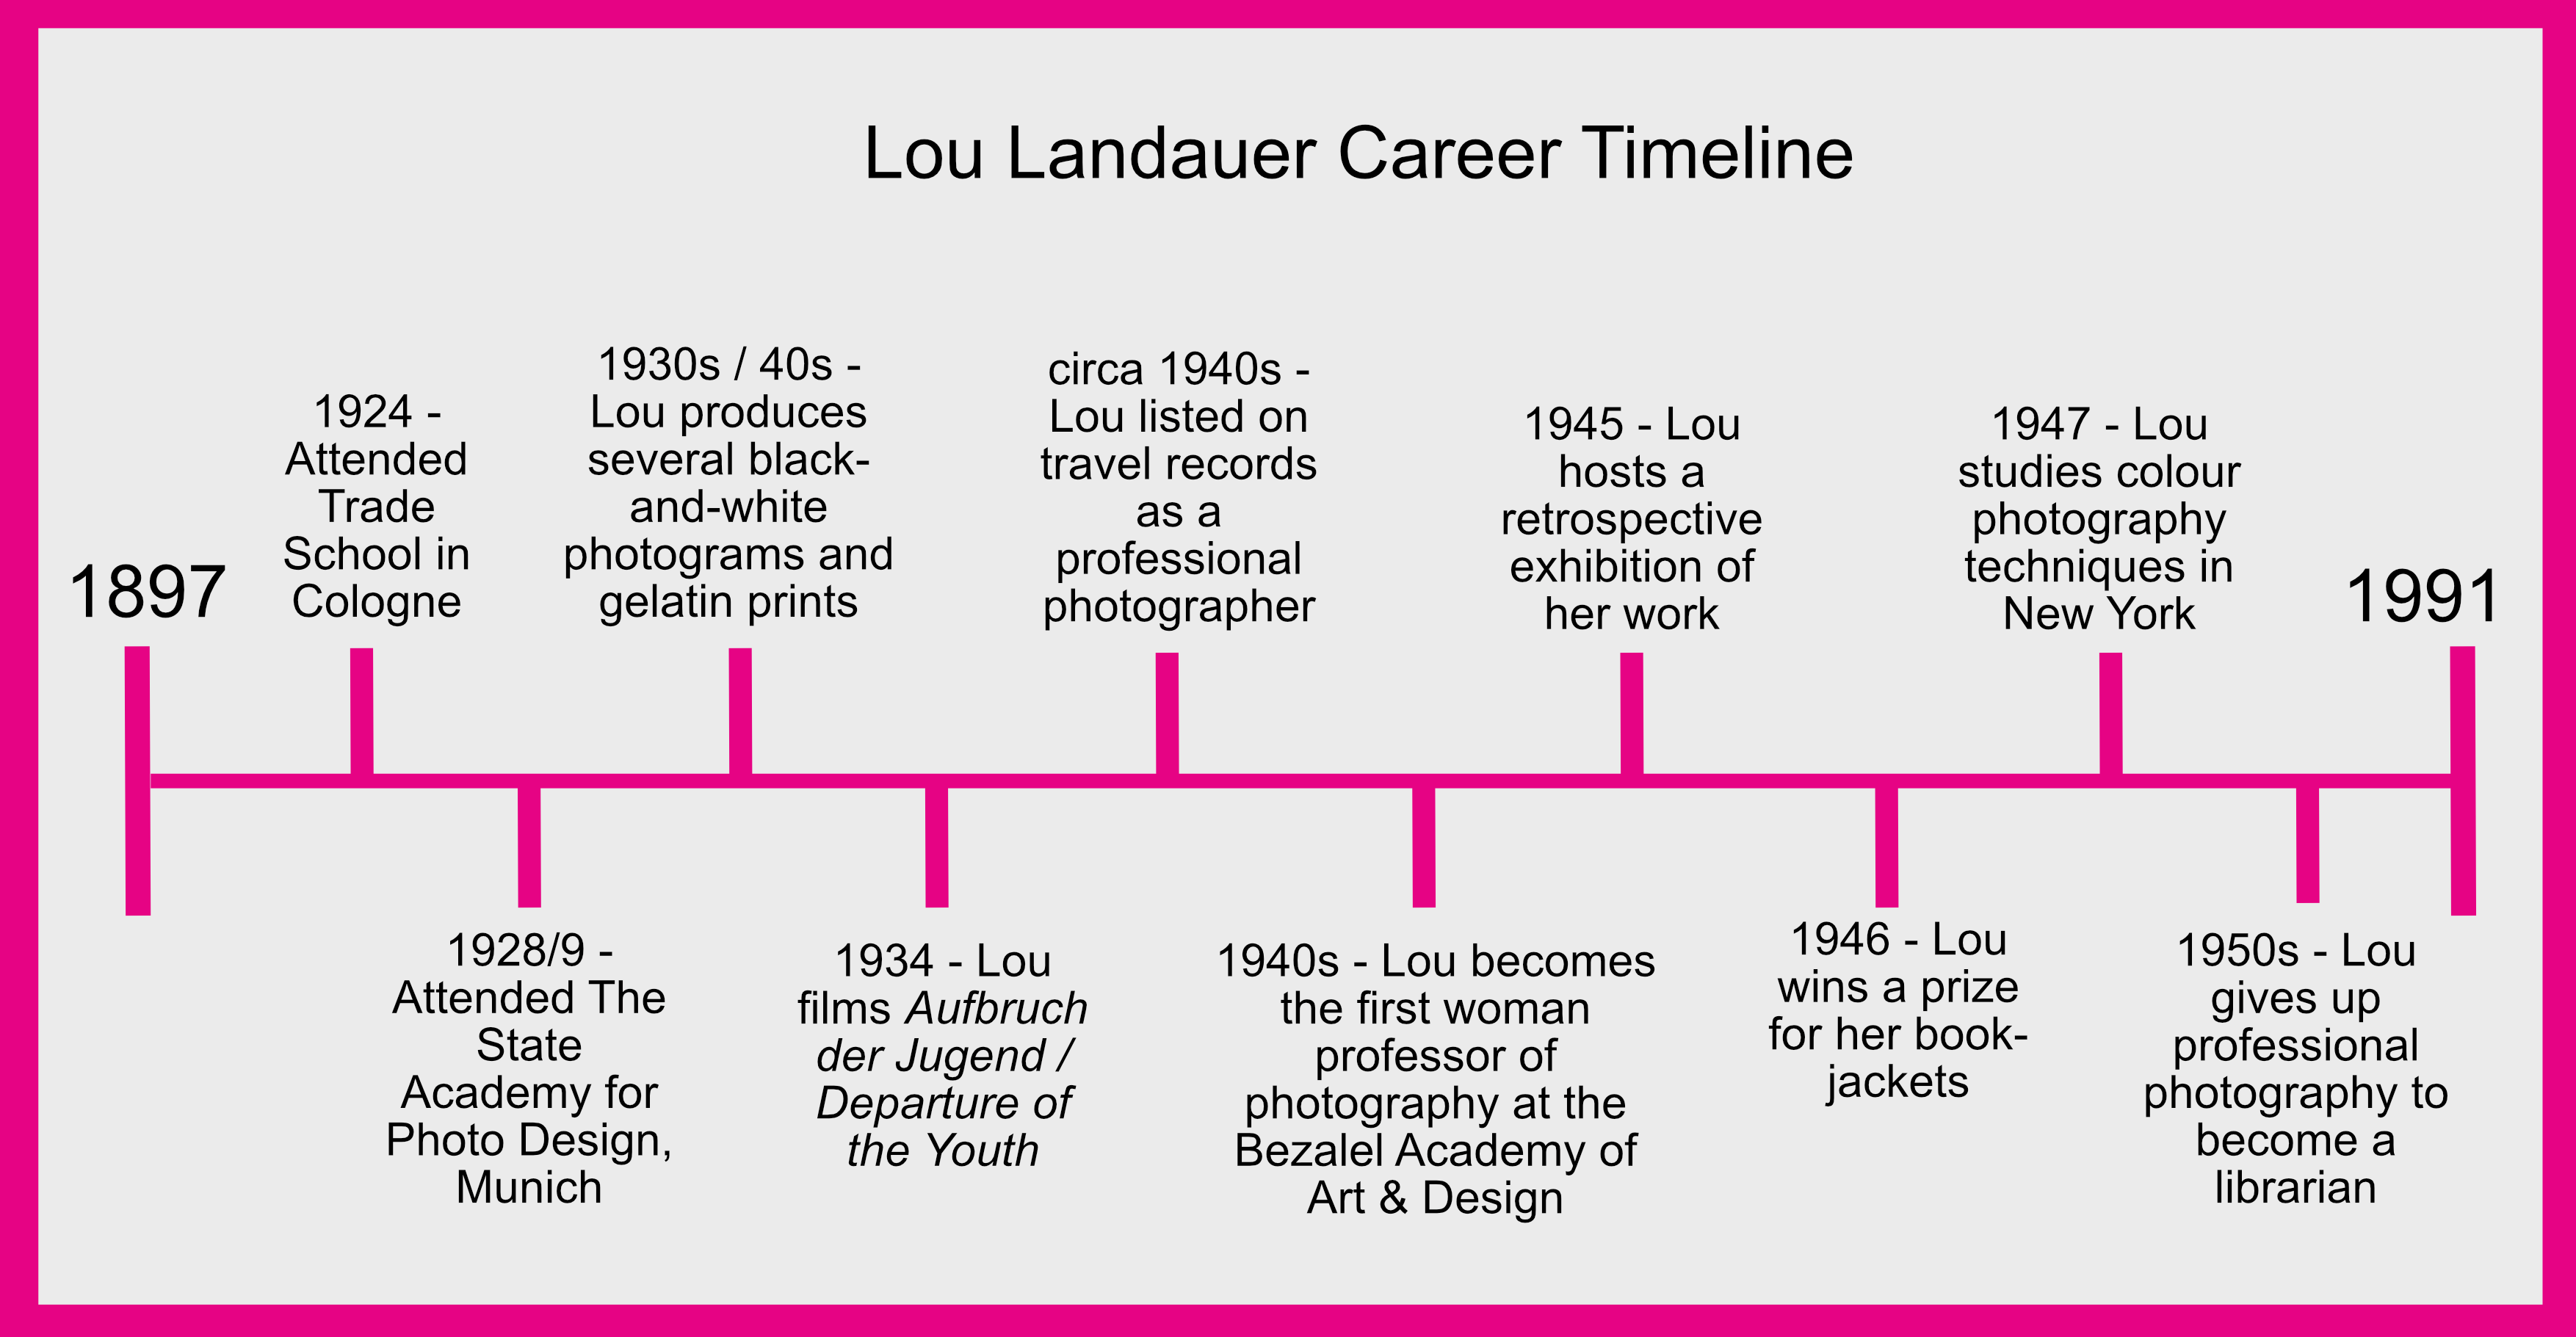 Timeline of Lou Landauer's career